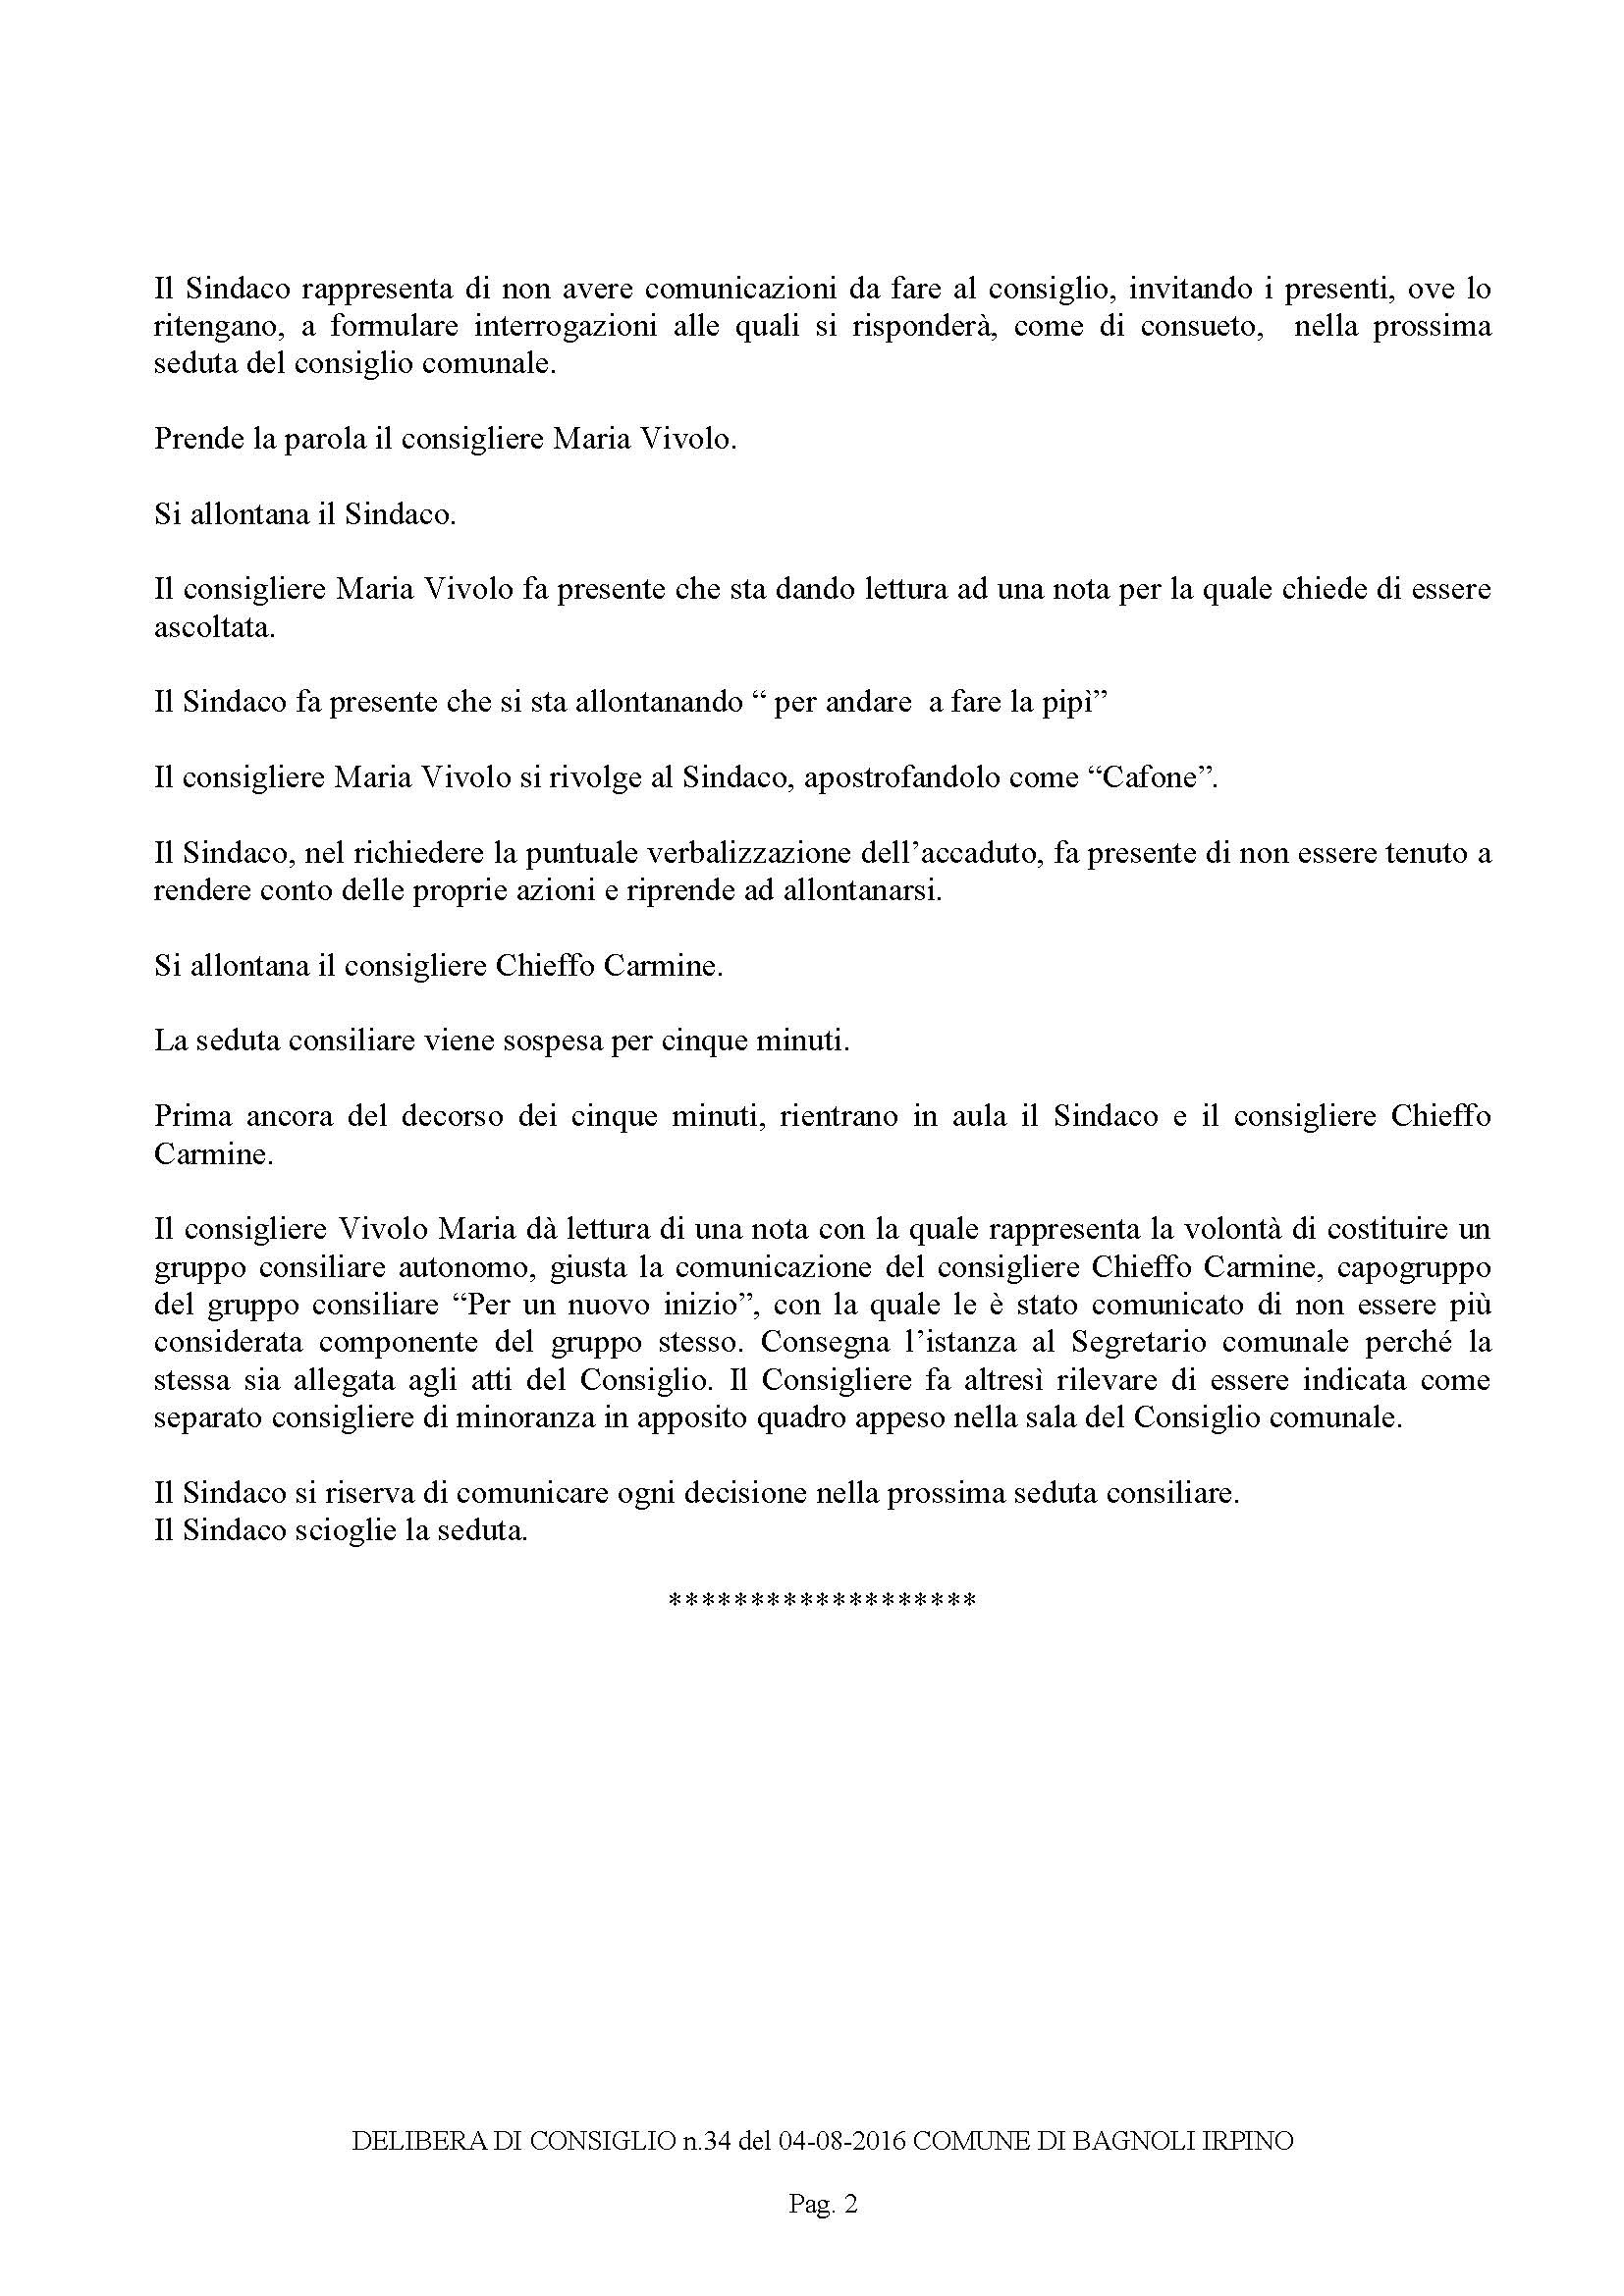 Bagnoli-Verbale-CONSIGLIO-n-34-agosto-2016_Pagina_2